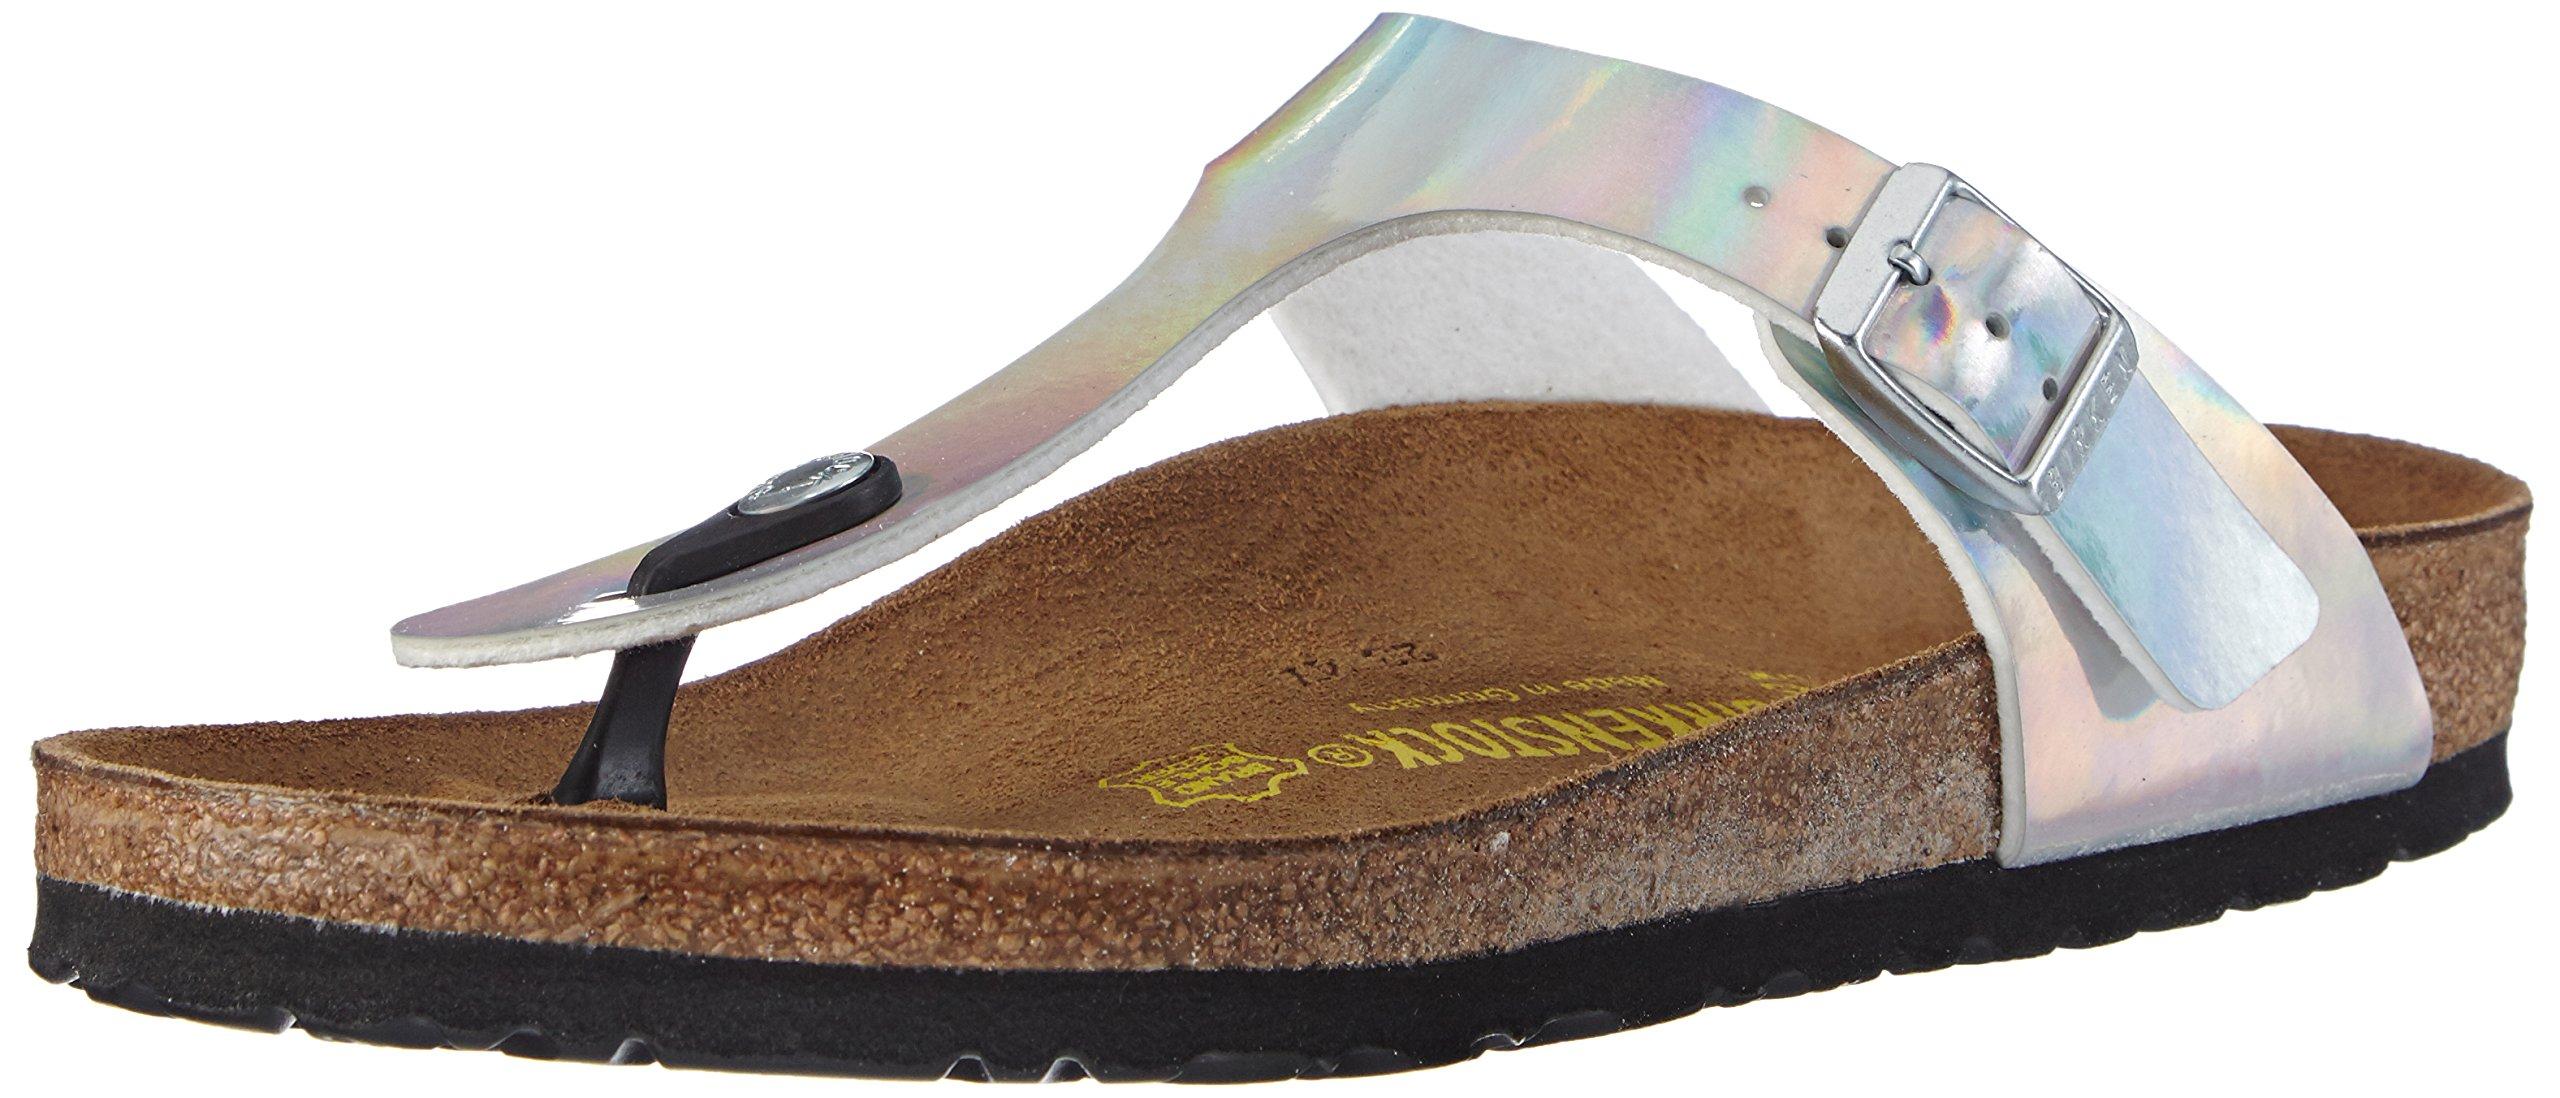 Birkenstock Classic Gizeh BirkoFlor - Buckled Toe Post Thong Style - Flip Flop Sandal UK4 - EU37 - US6 - AU5 Mirror Silver